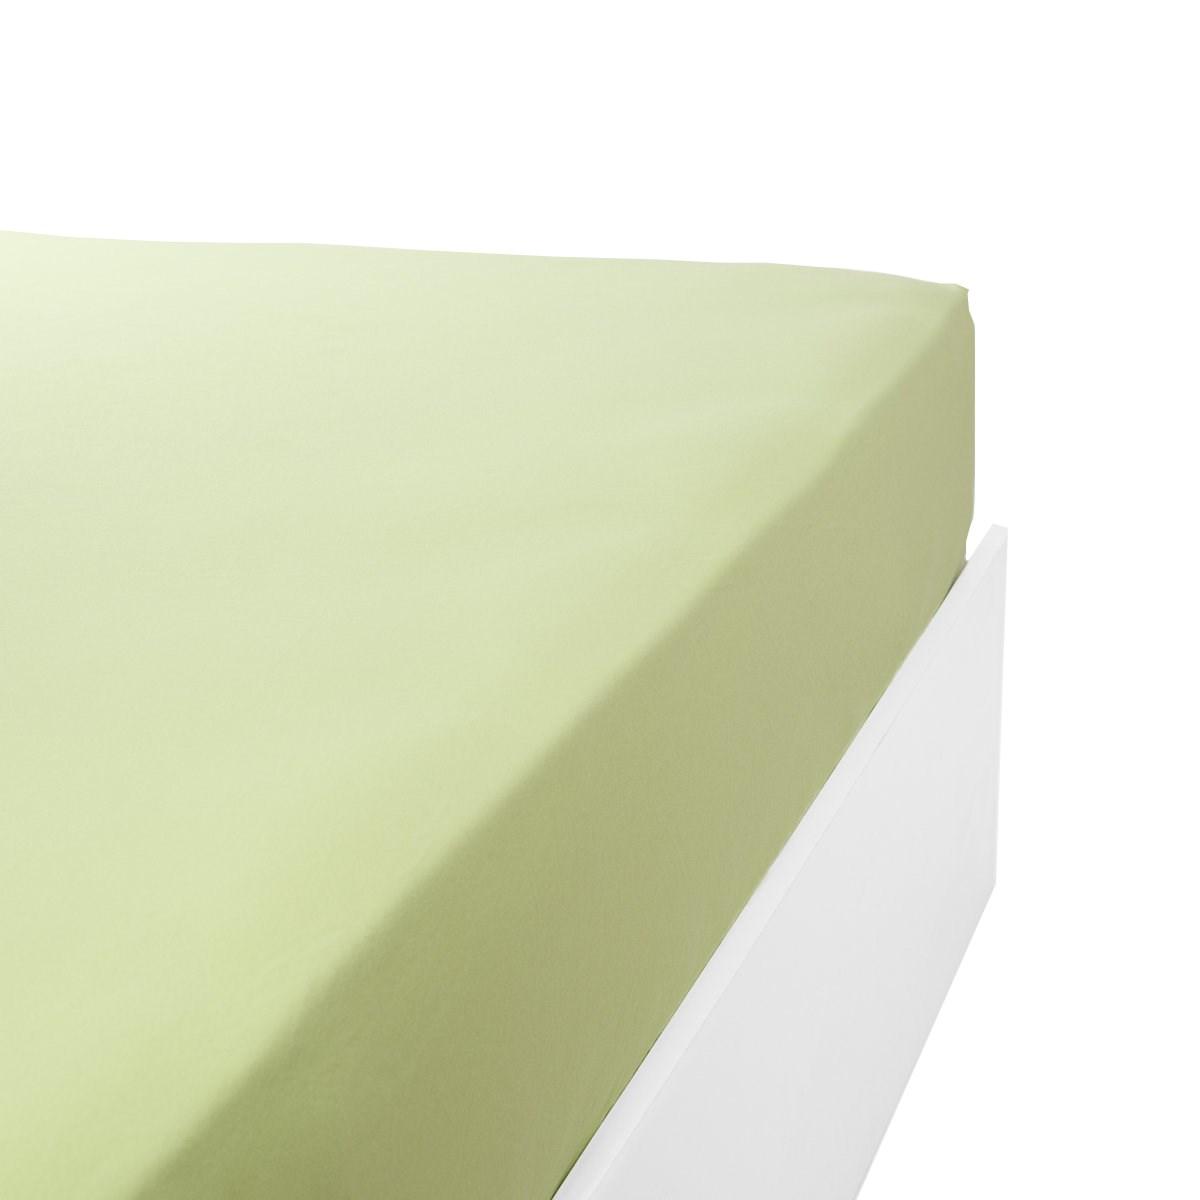 Drap housse flanelle en Molleton Vert anis 110x190 cm